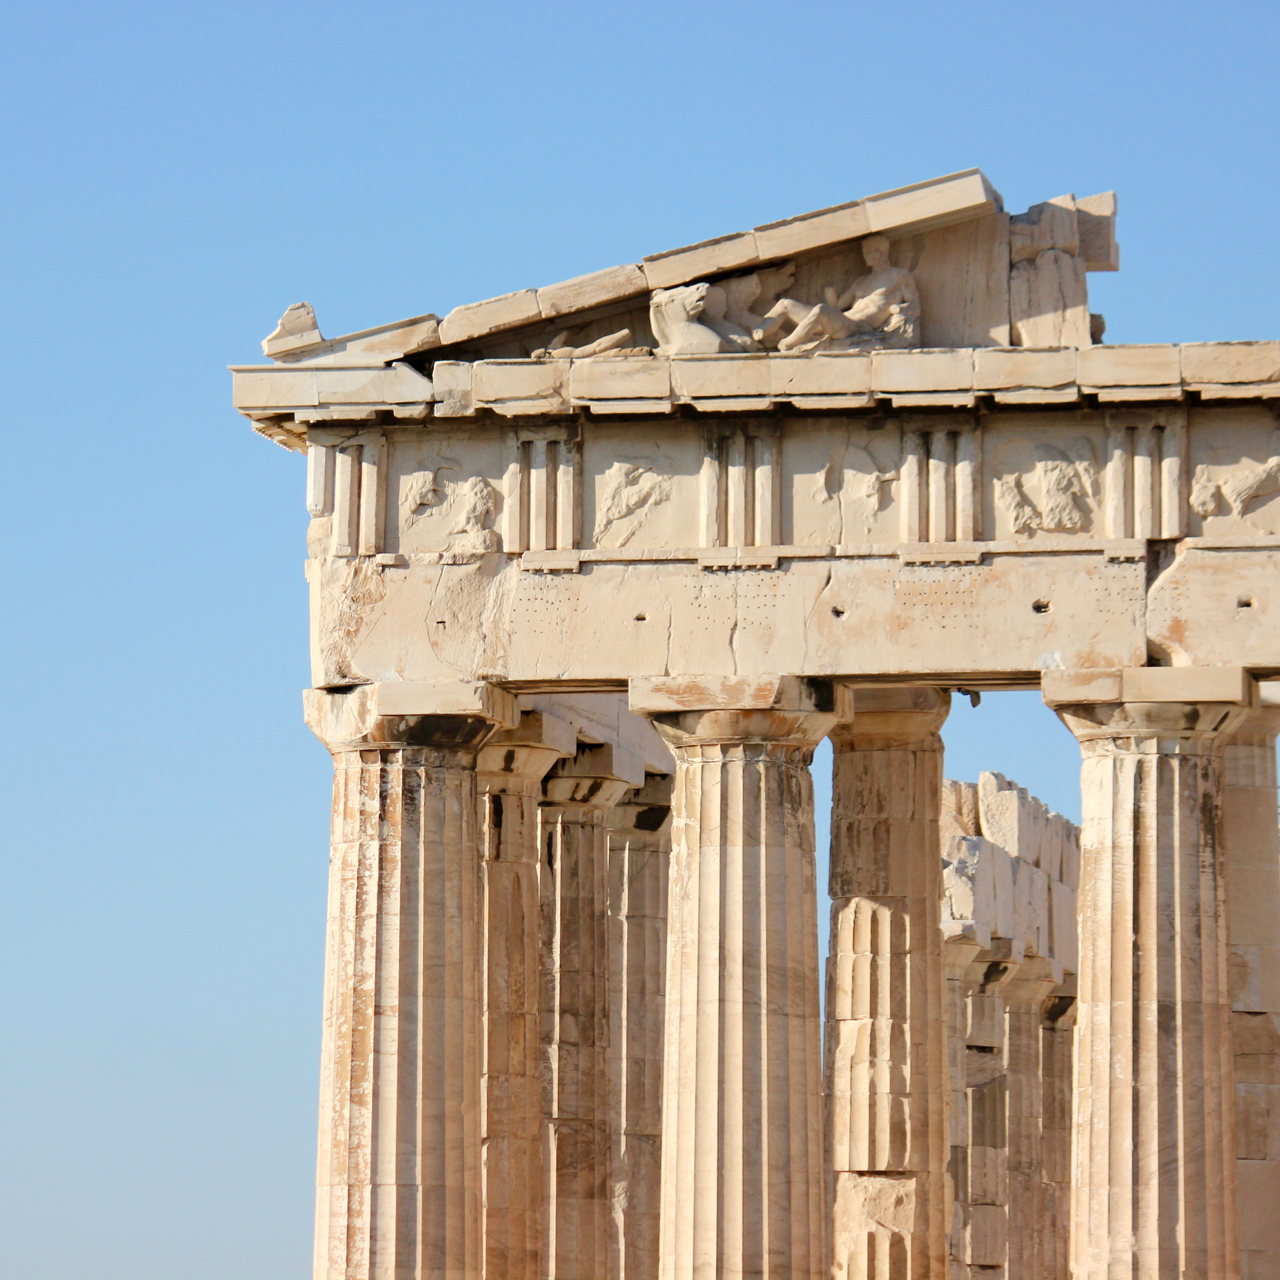 Athens, Greece - 12